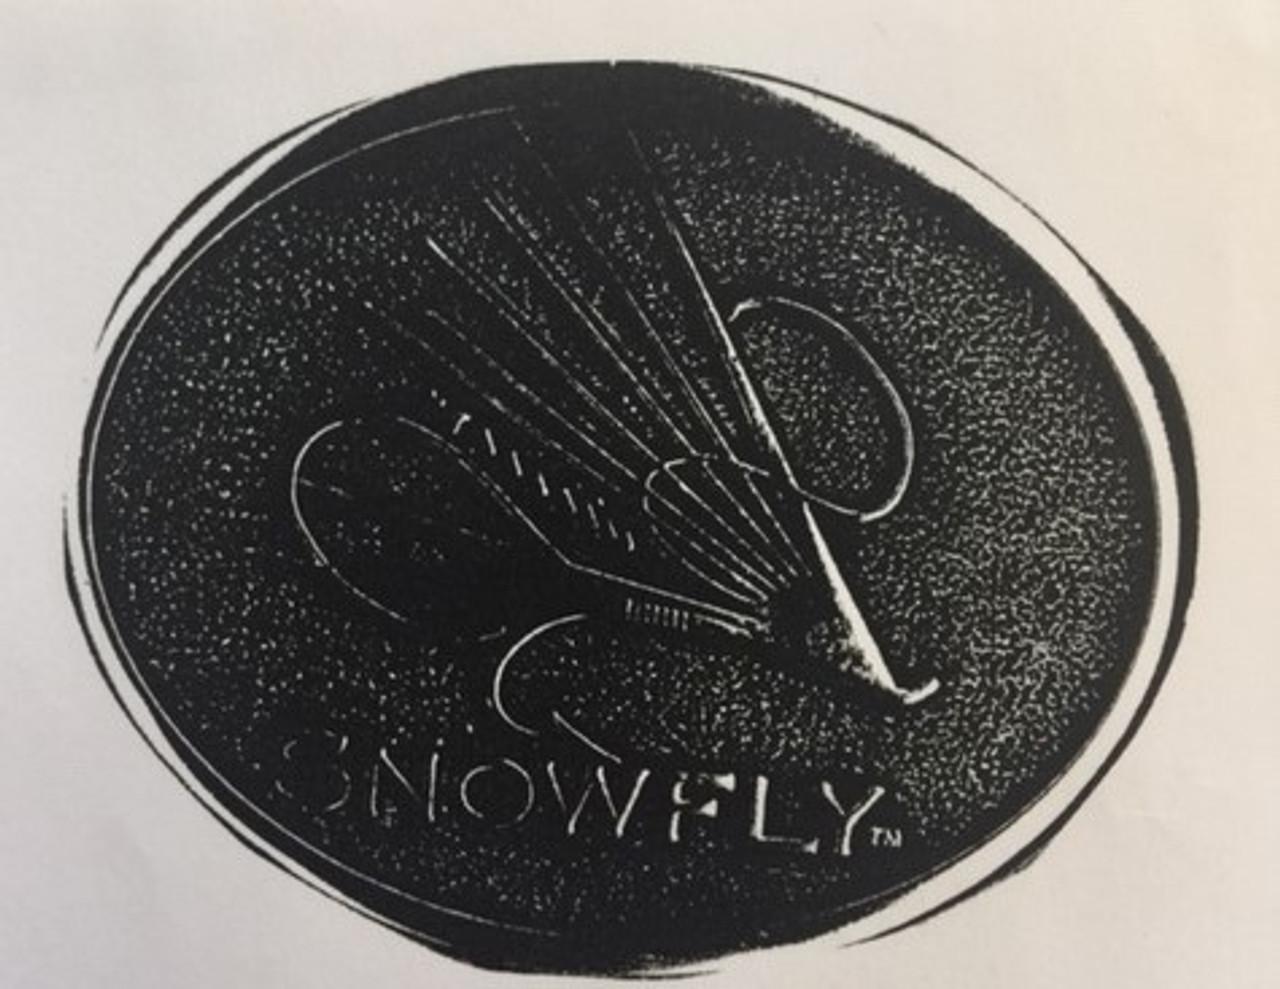 Snowfly Buckle